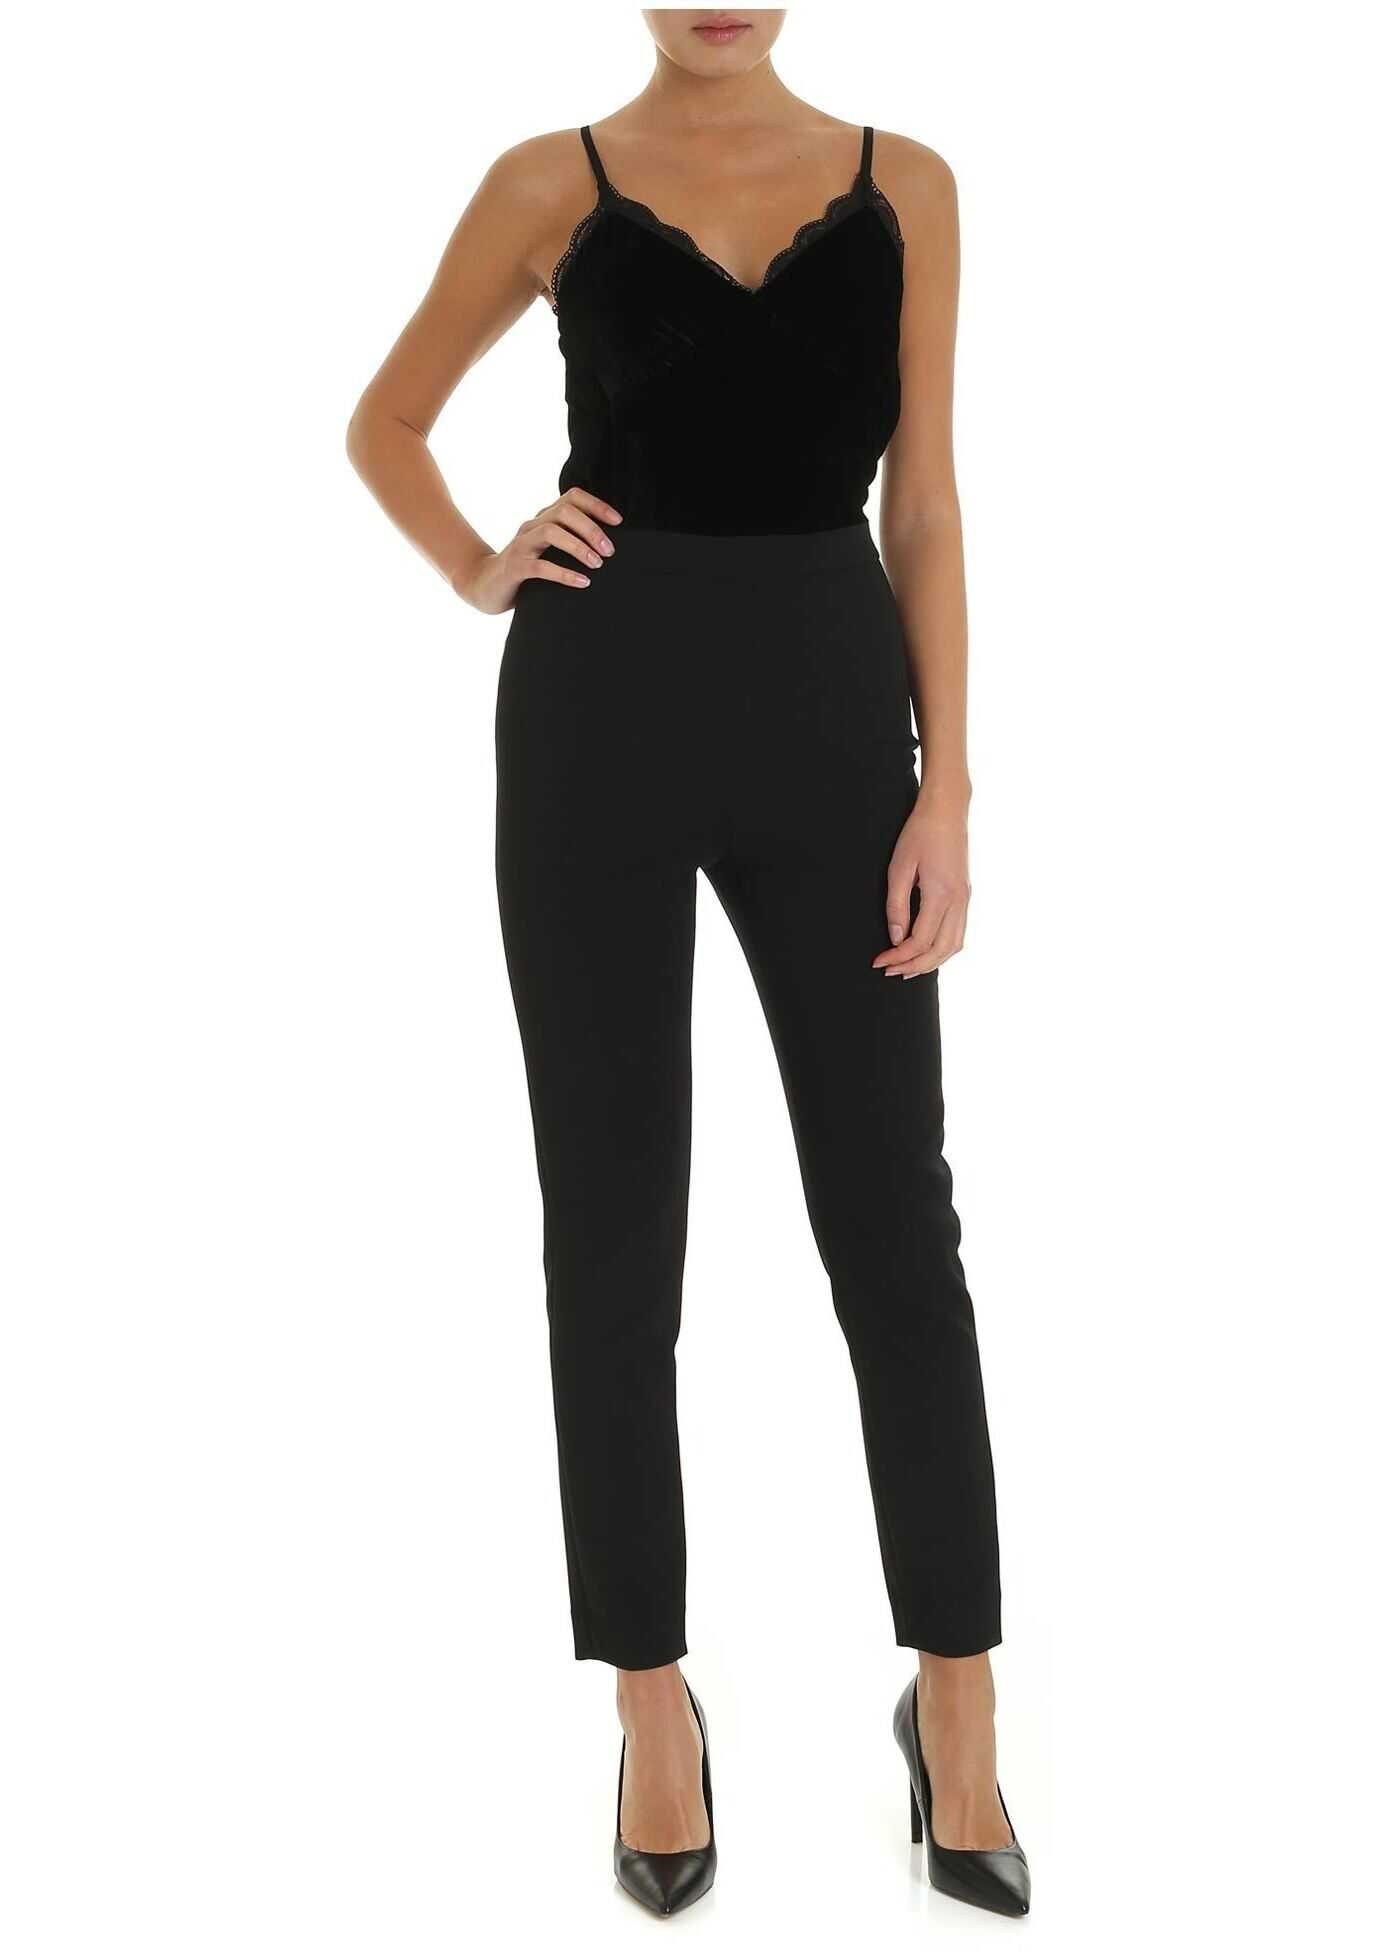 Michael Kors Black Jumpsuit With Chenille Top Black